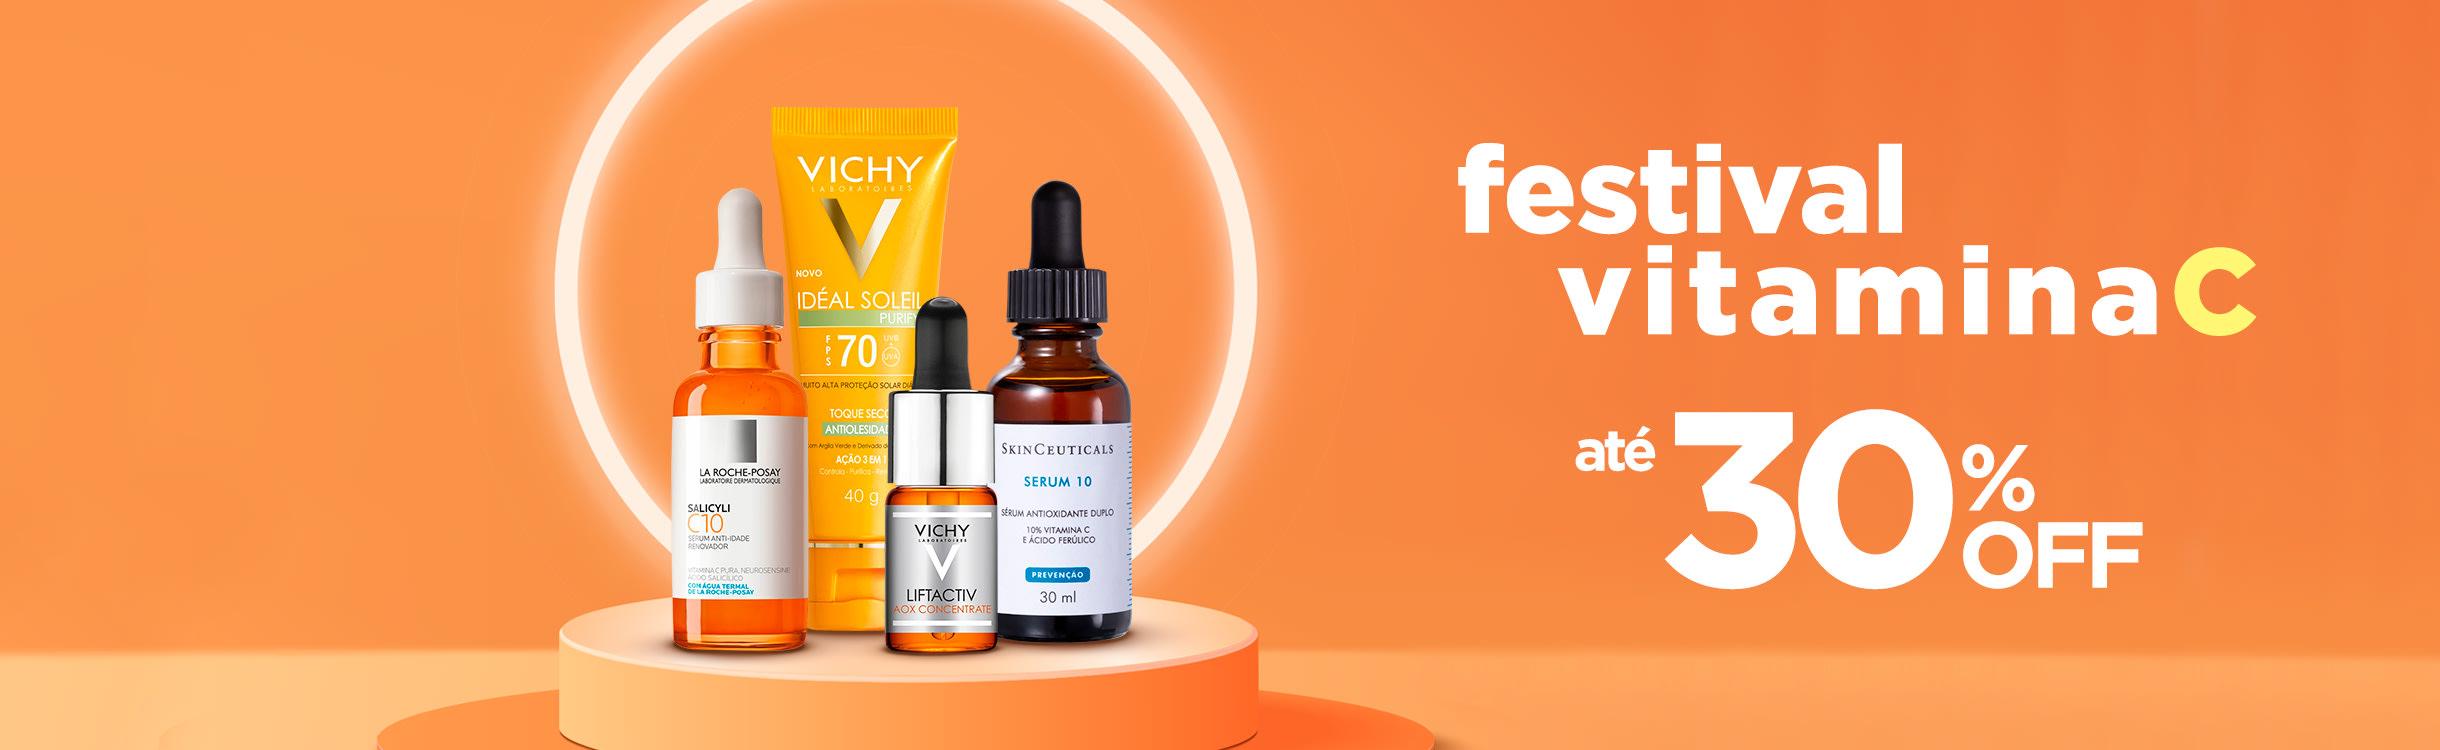 Festival Vitamina C